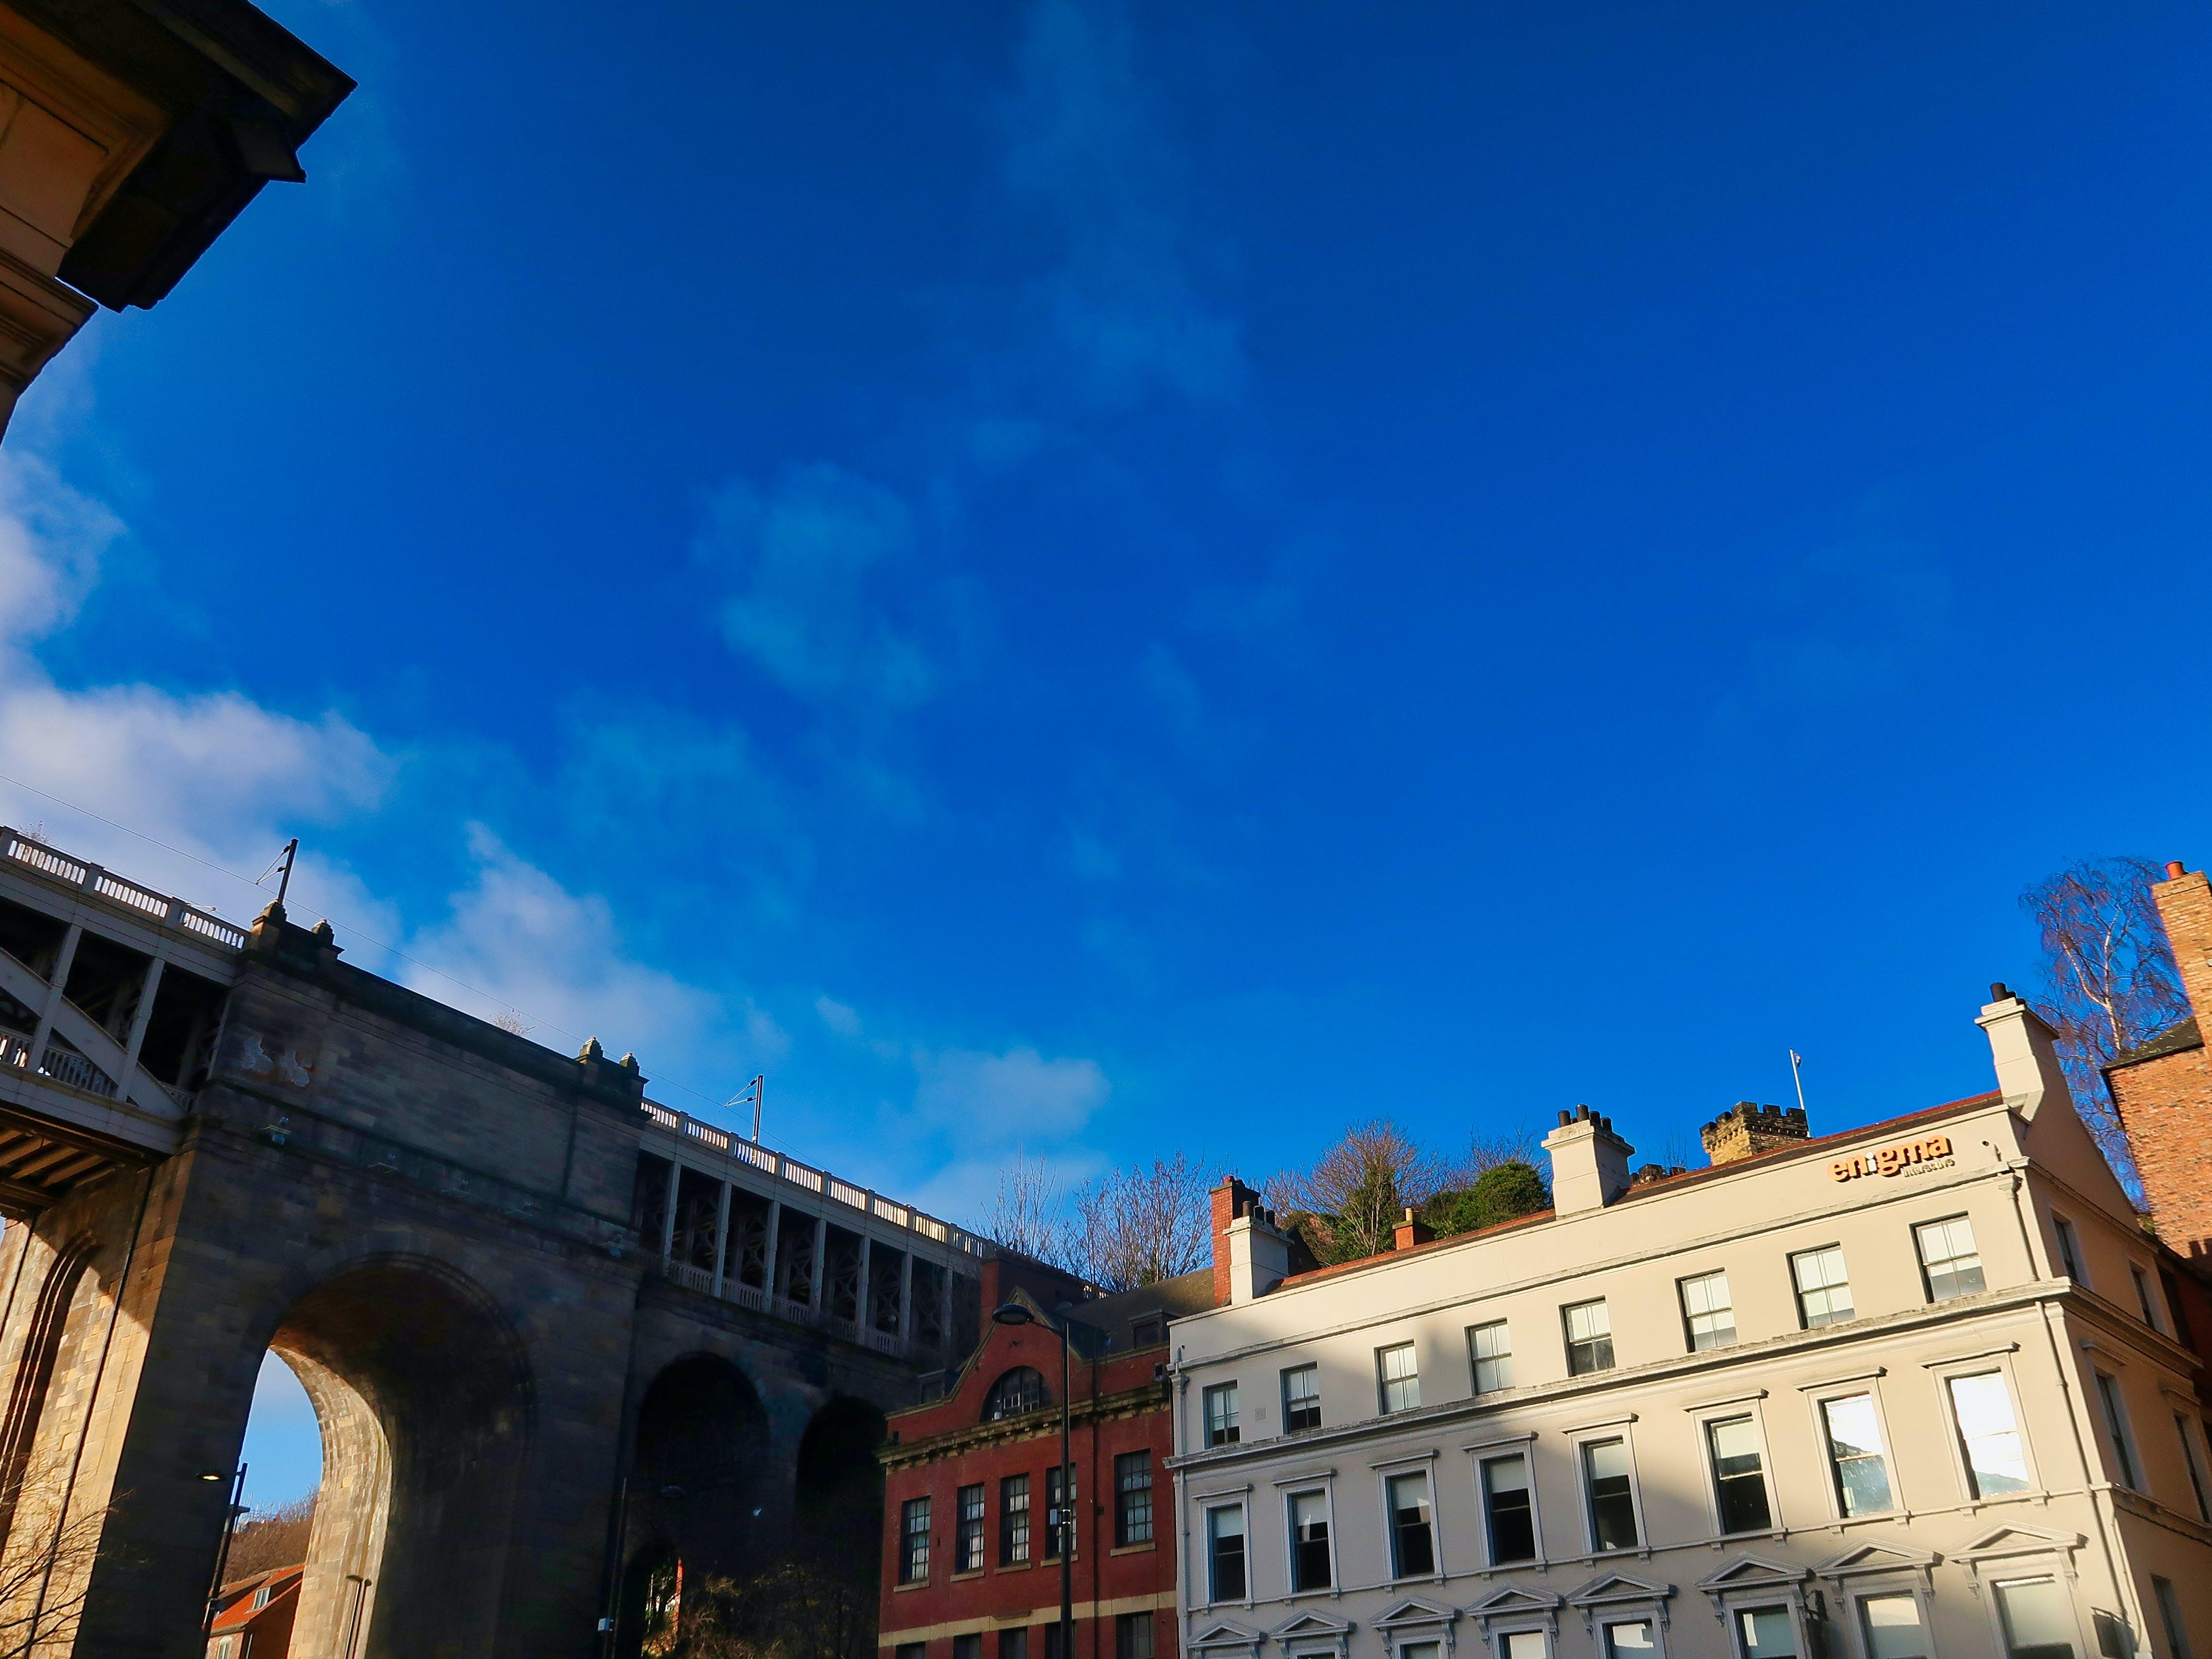 blue, bridge, buildings